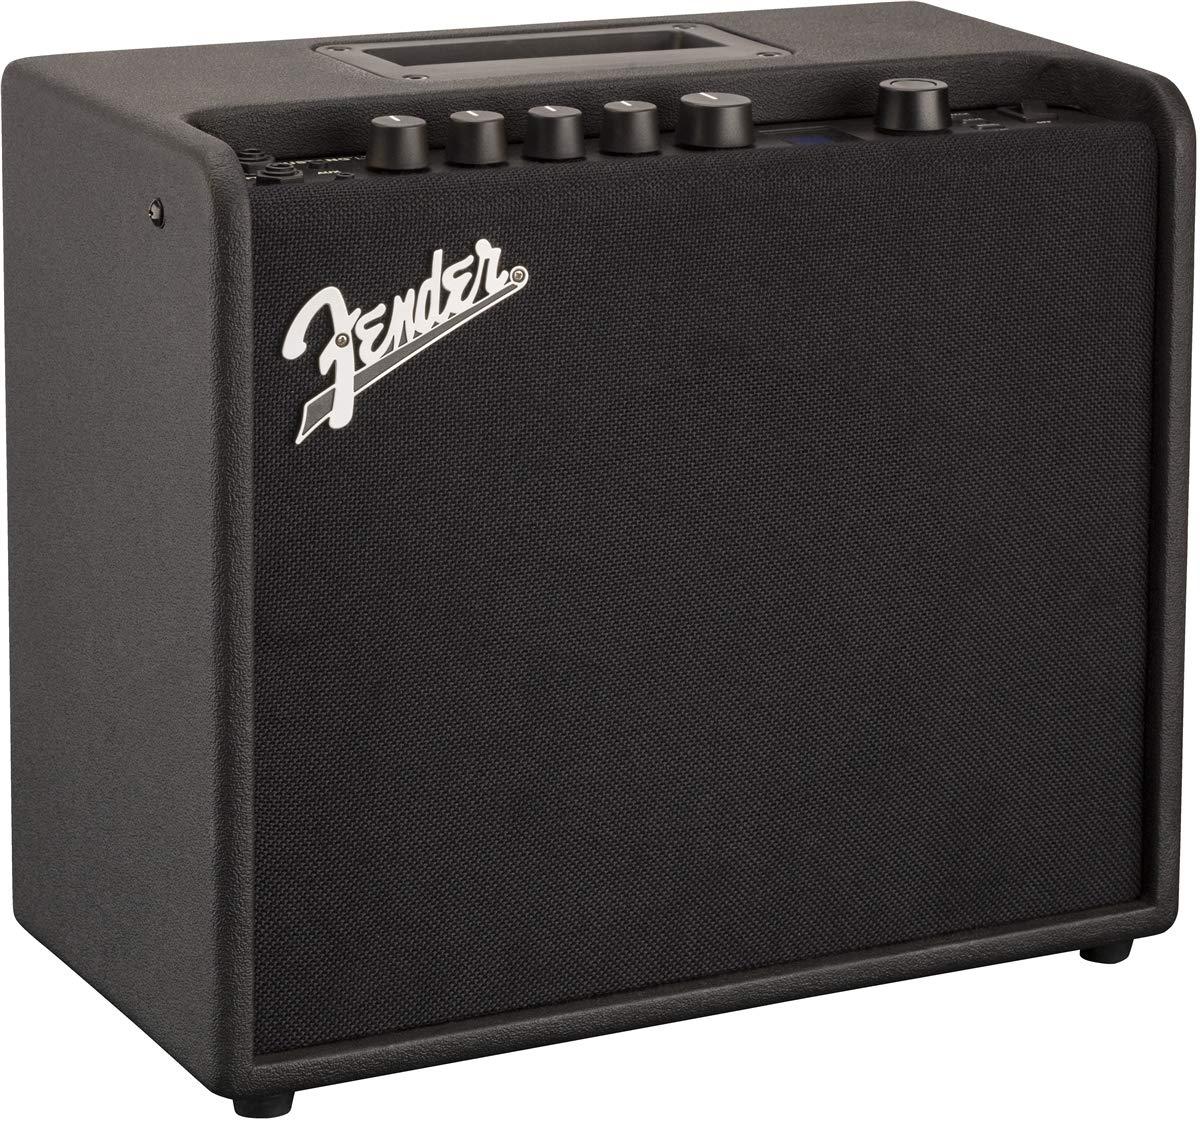 Fender Mustang LT-25 - Digital Guitar Amplifier by Fender (Image #3)